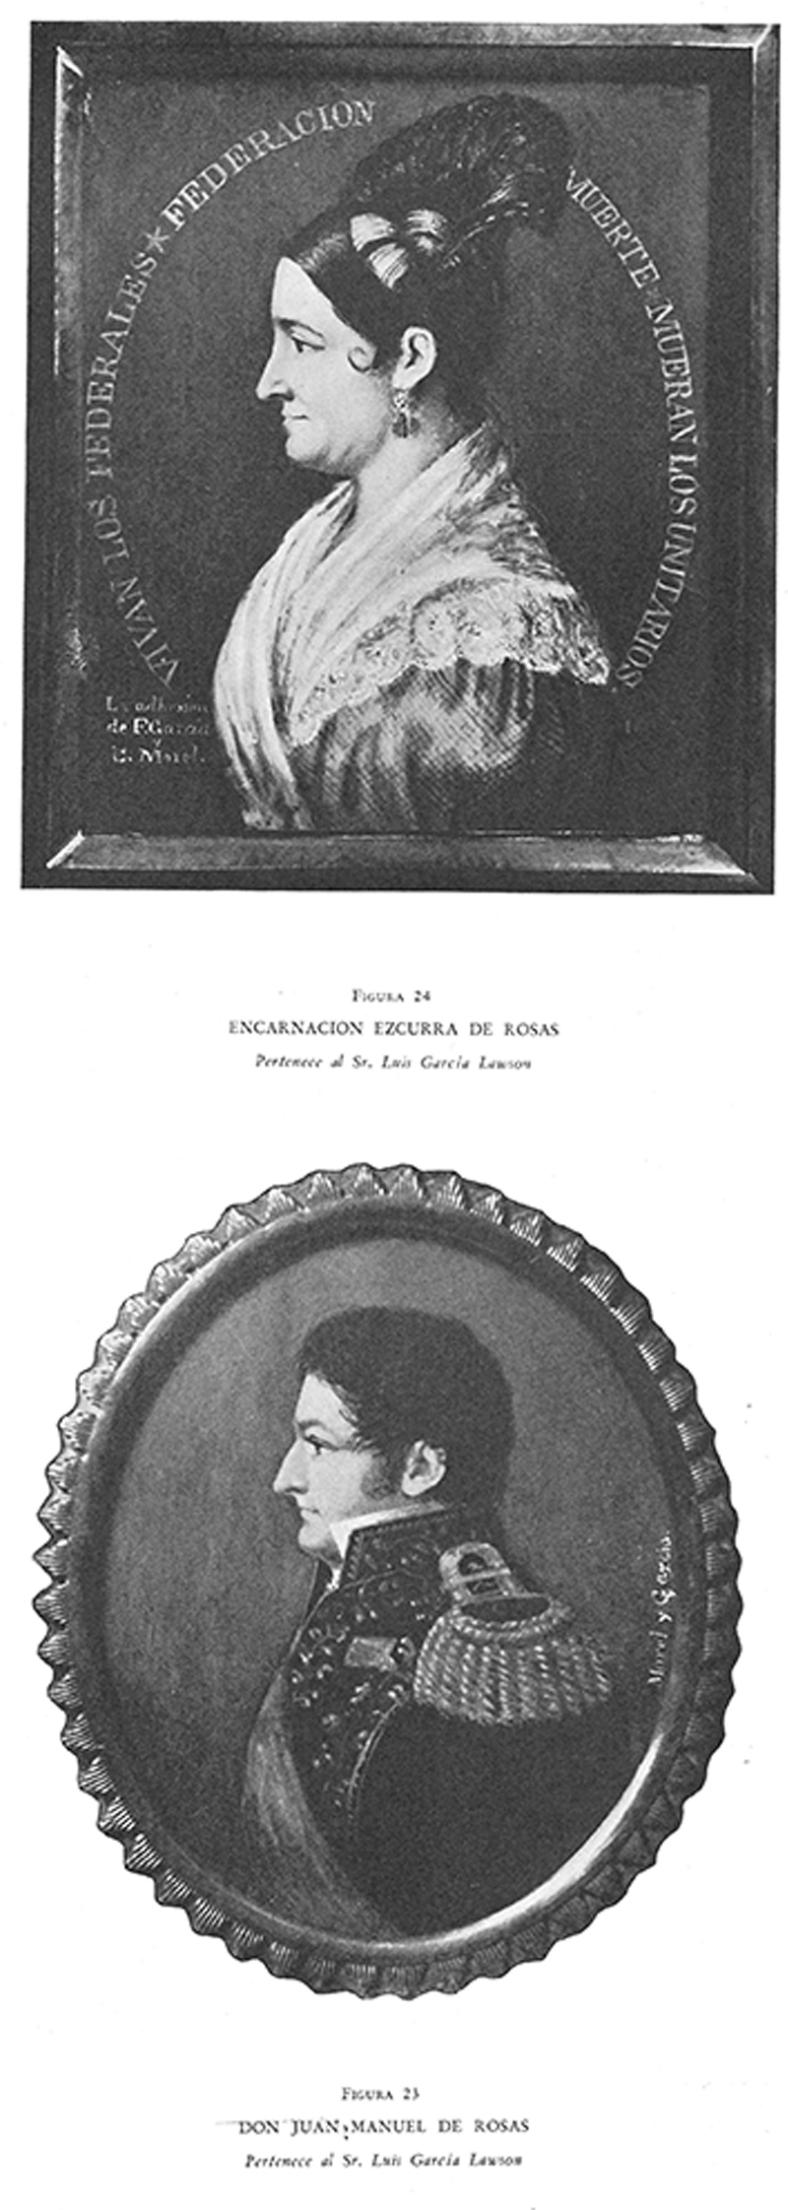 Encarnación Ezcurra de Rosas / Juan Manuel de Rosas